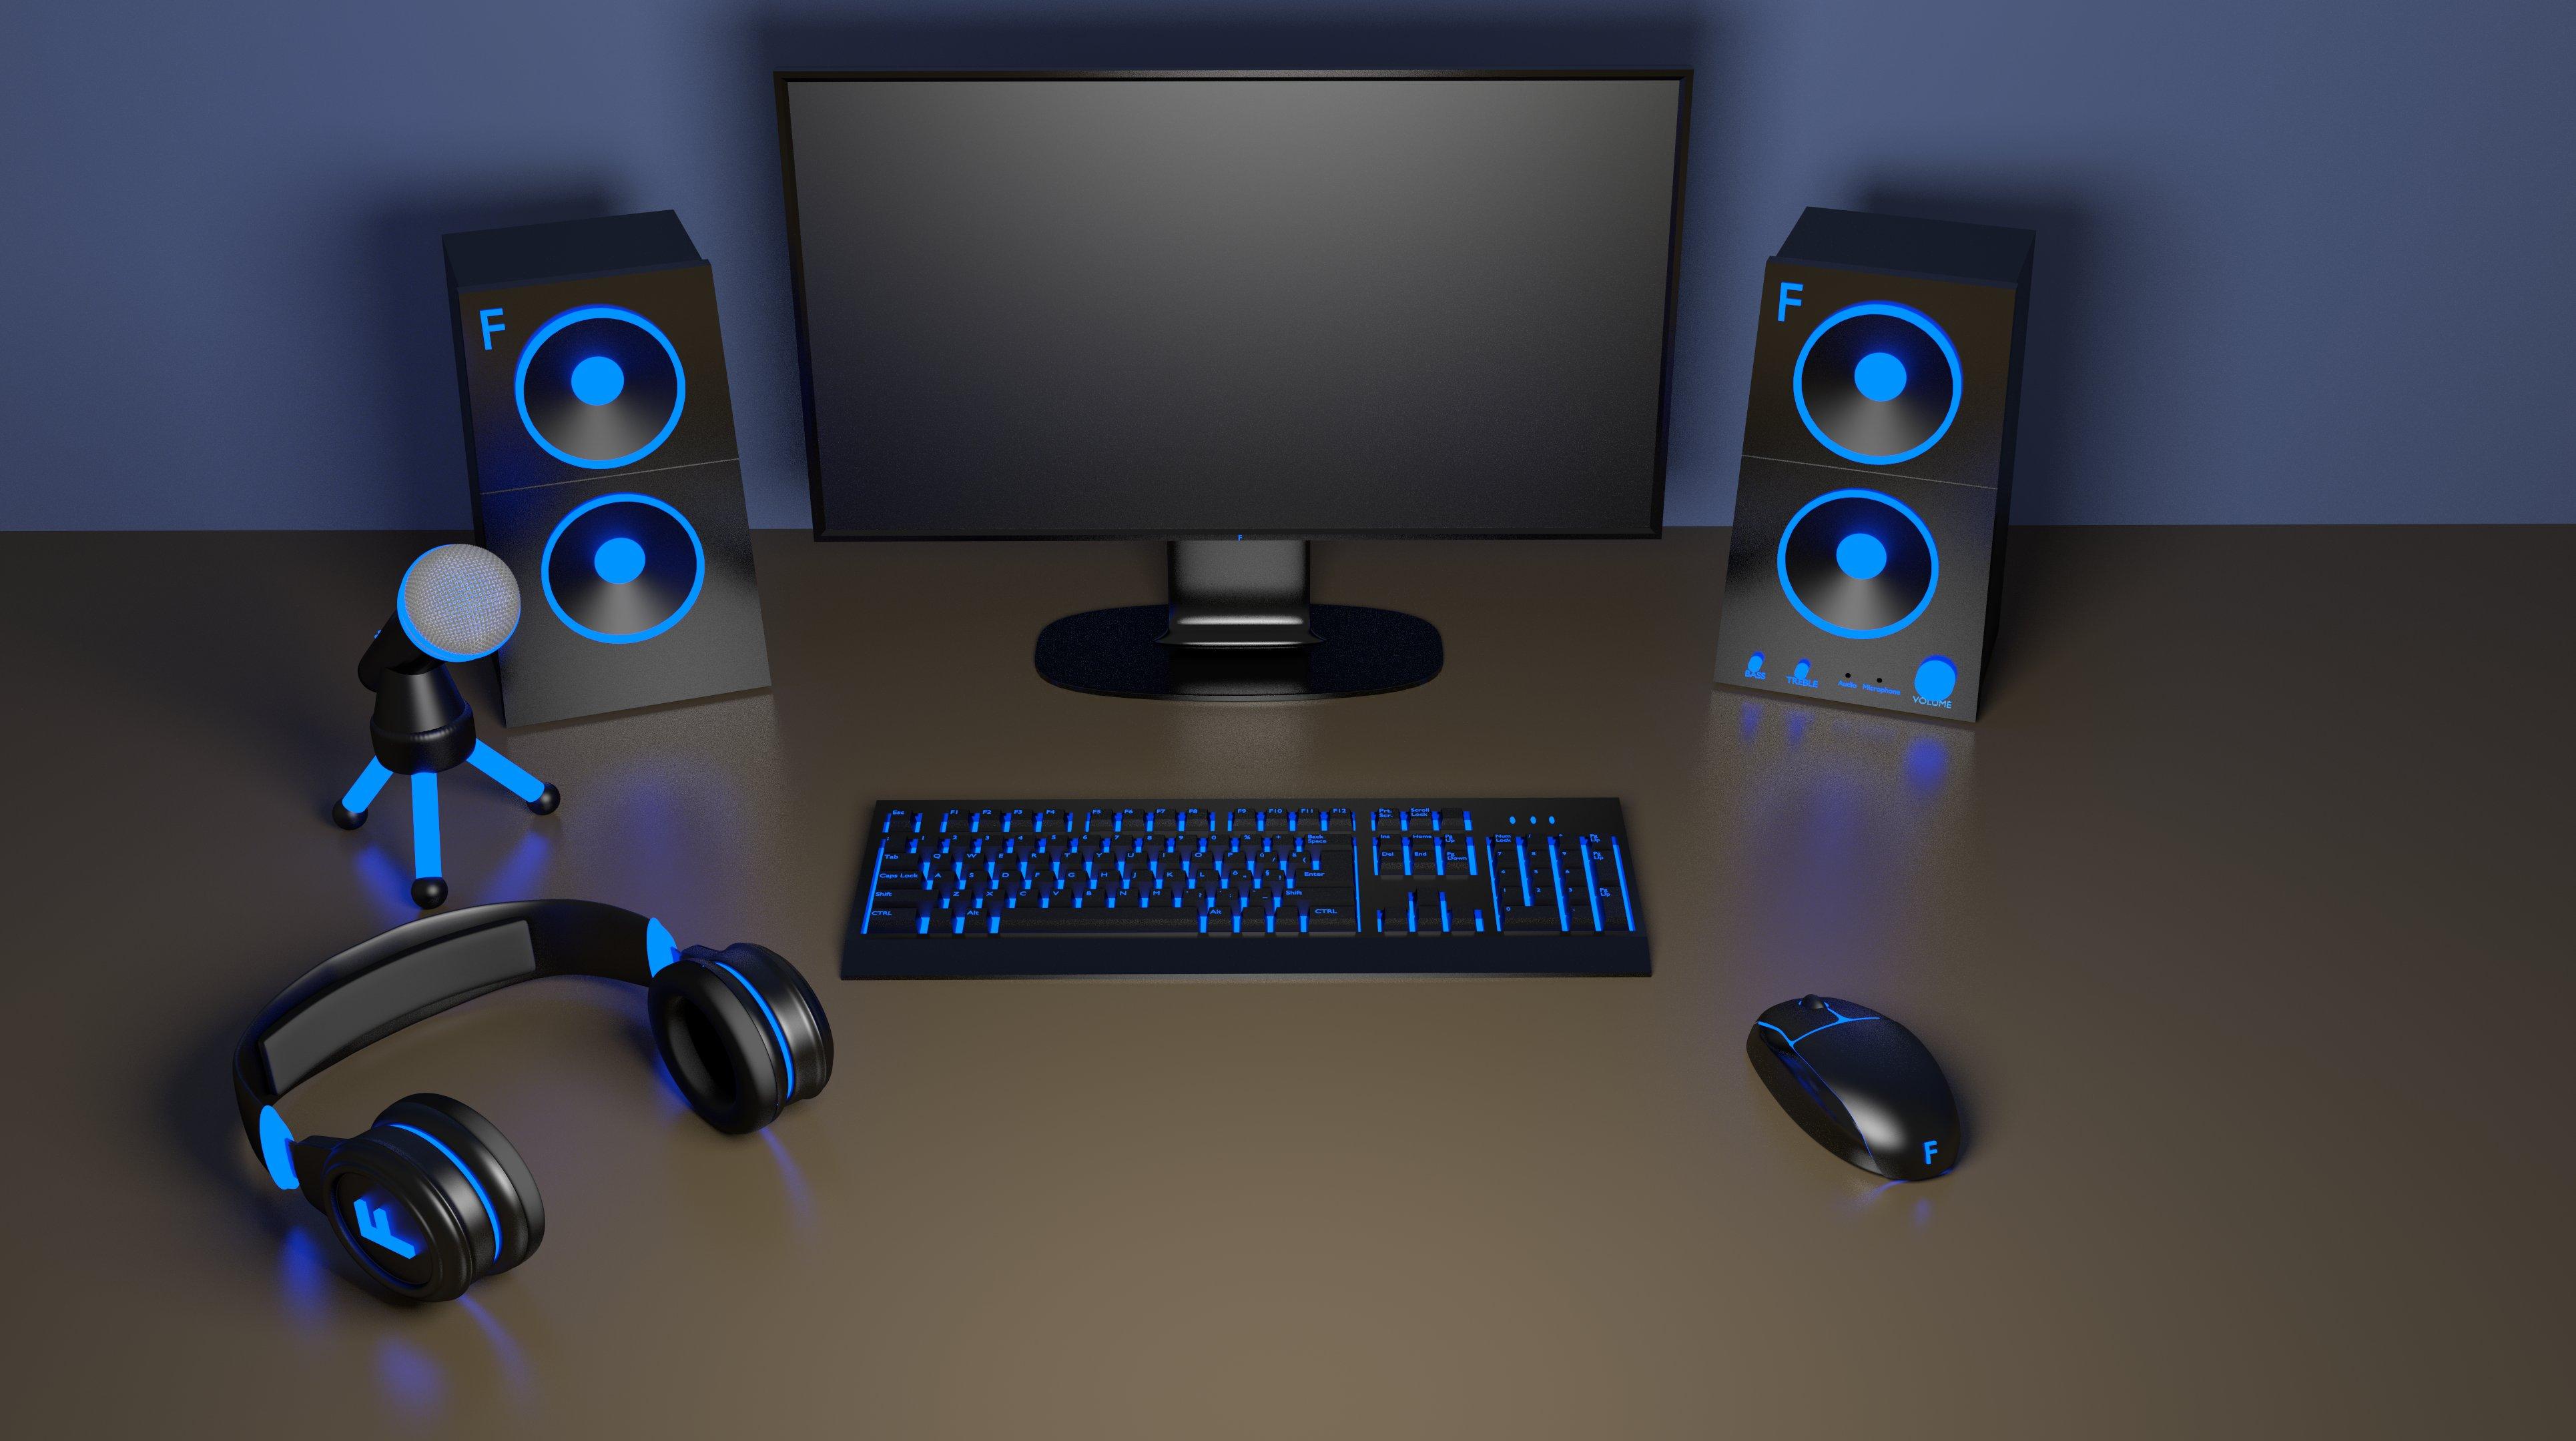 Computer setup headphones mouse keyboard mechanical speakers 3860x2160